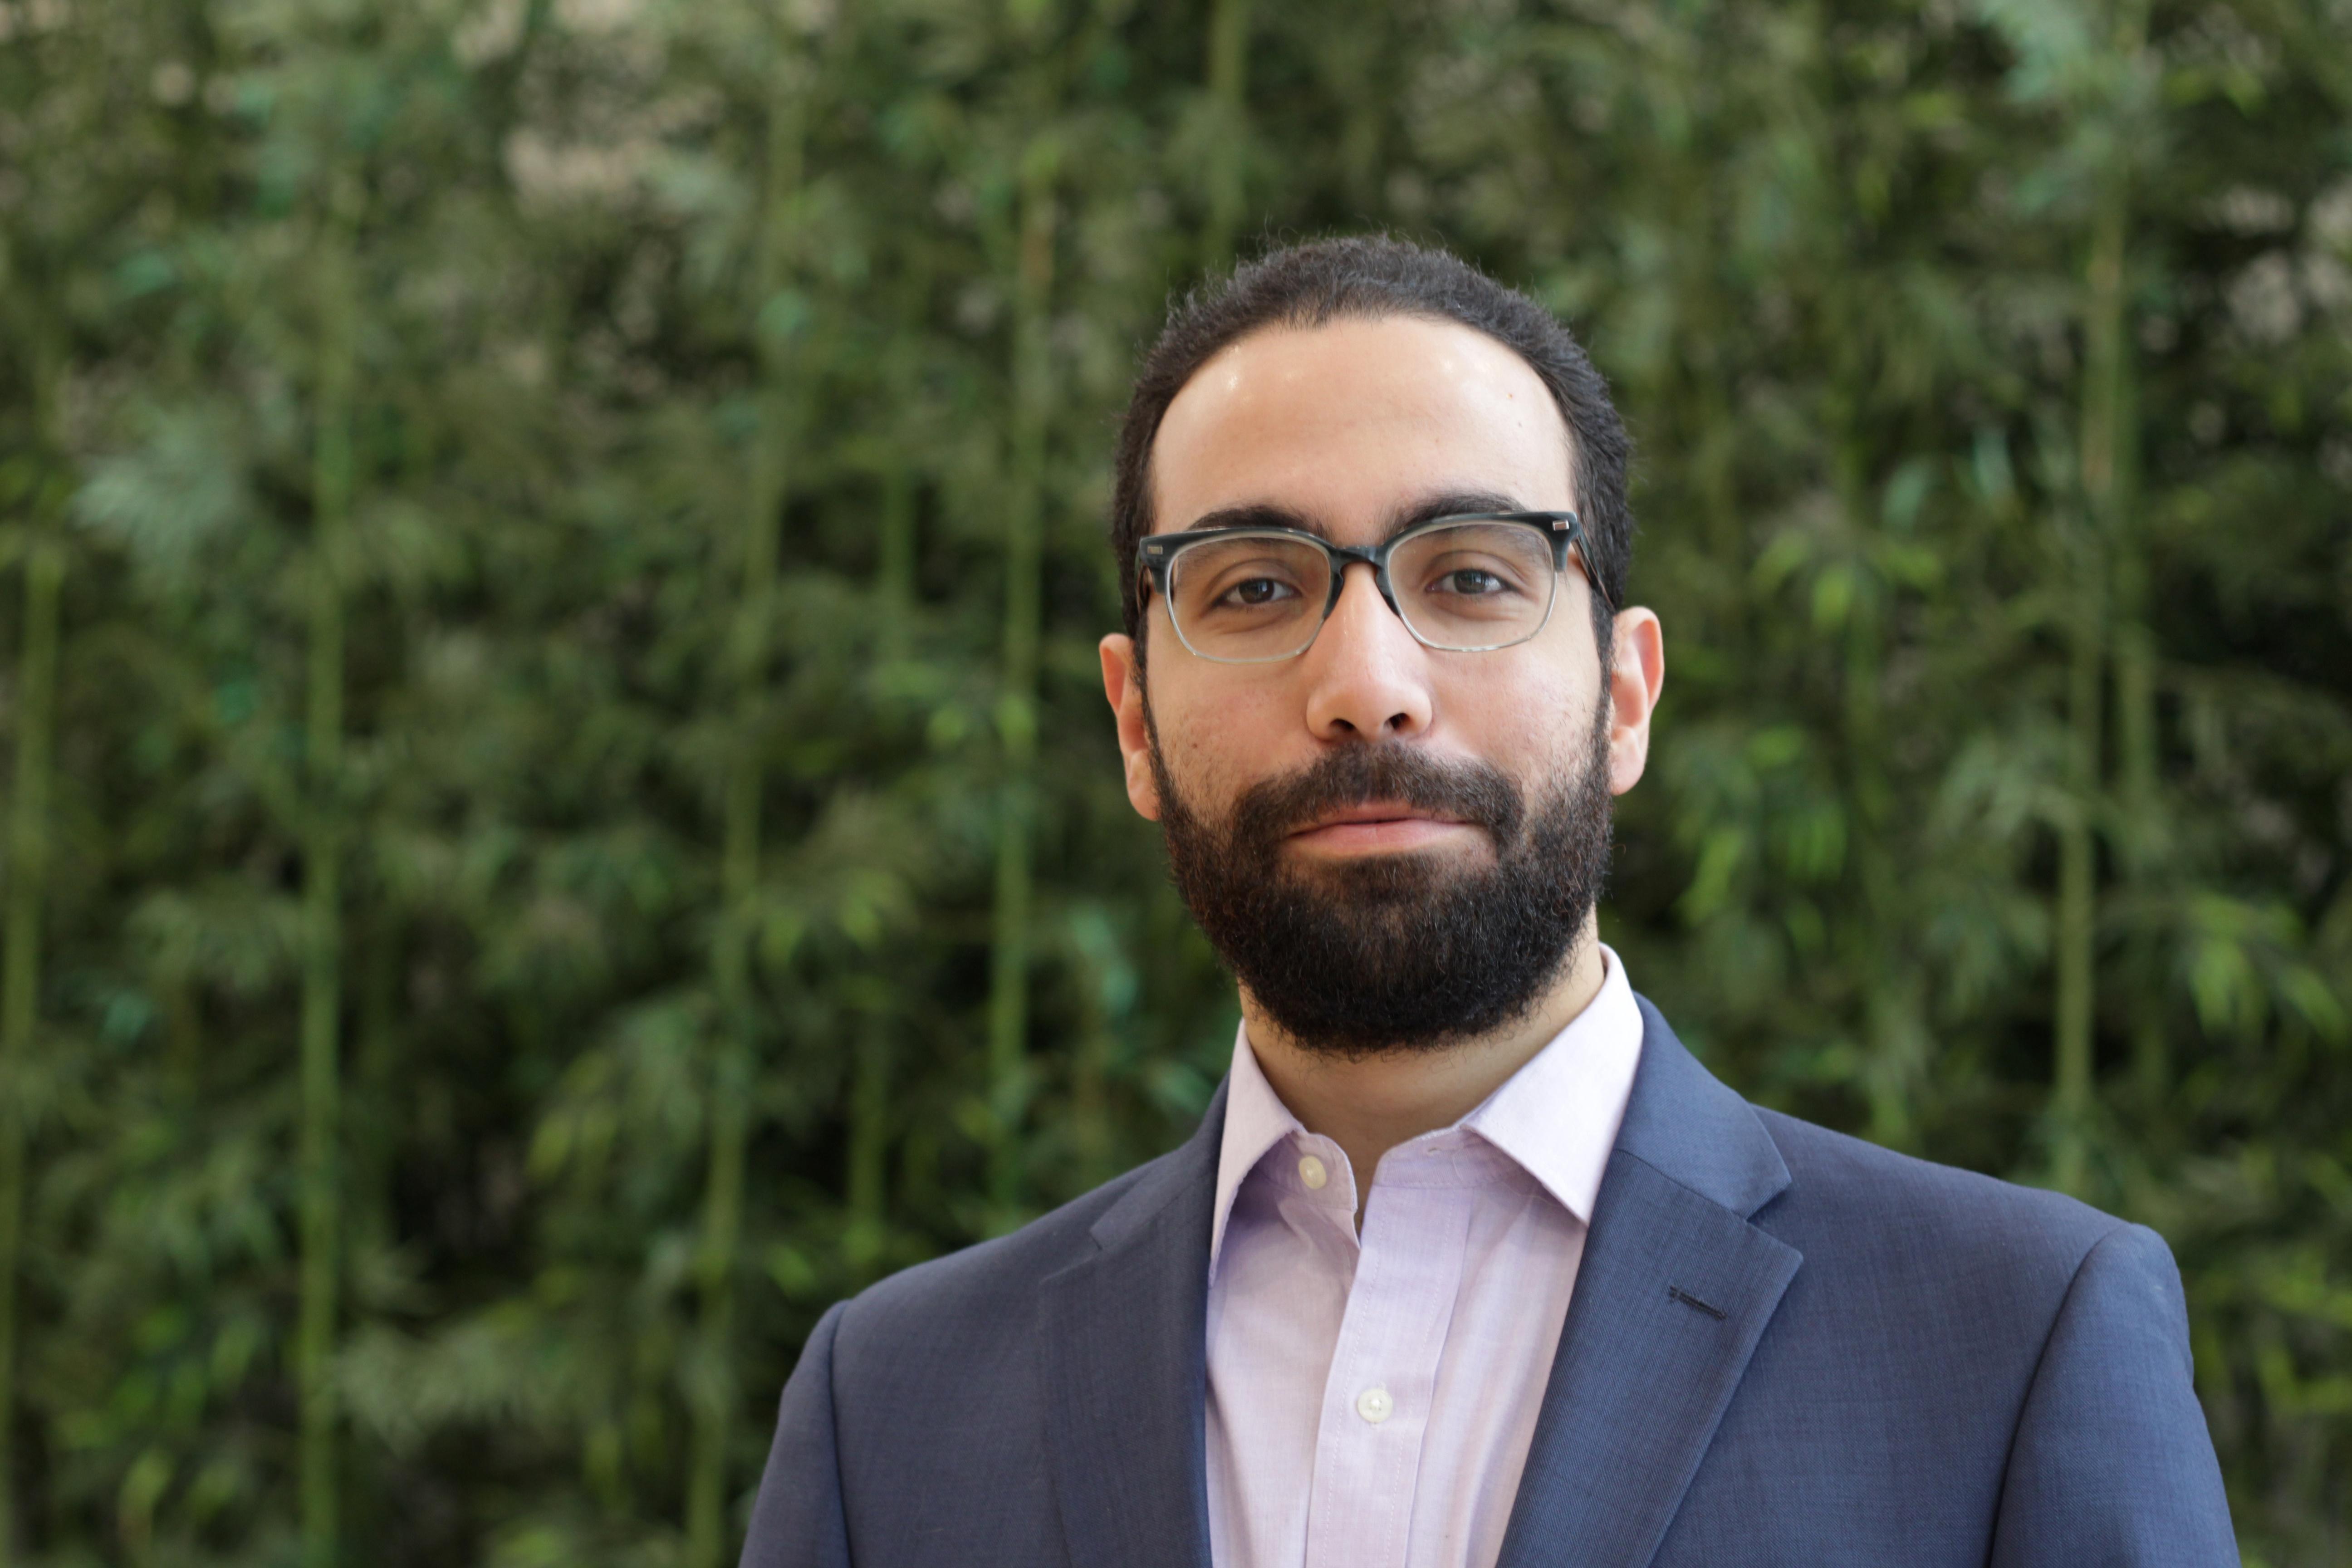 Abdul Ibrahim, research associate for Invest Buffalo Niagara.